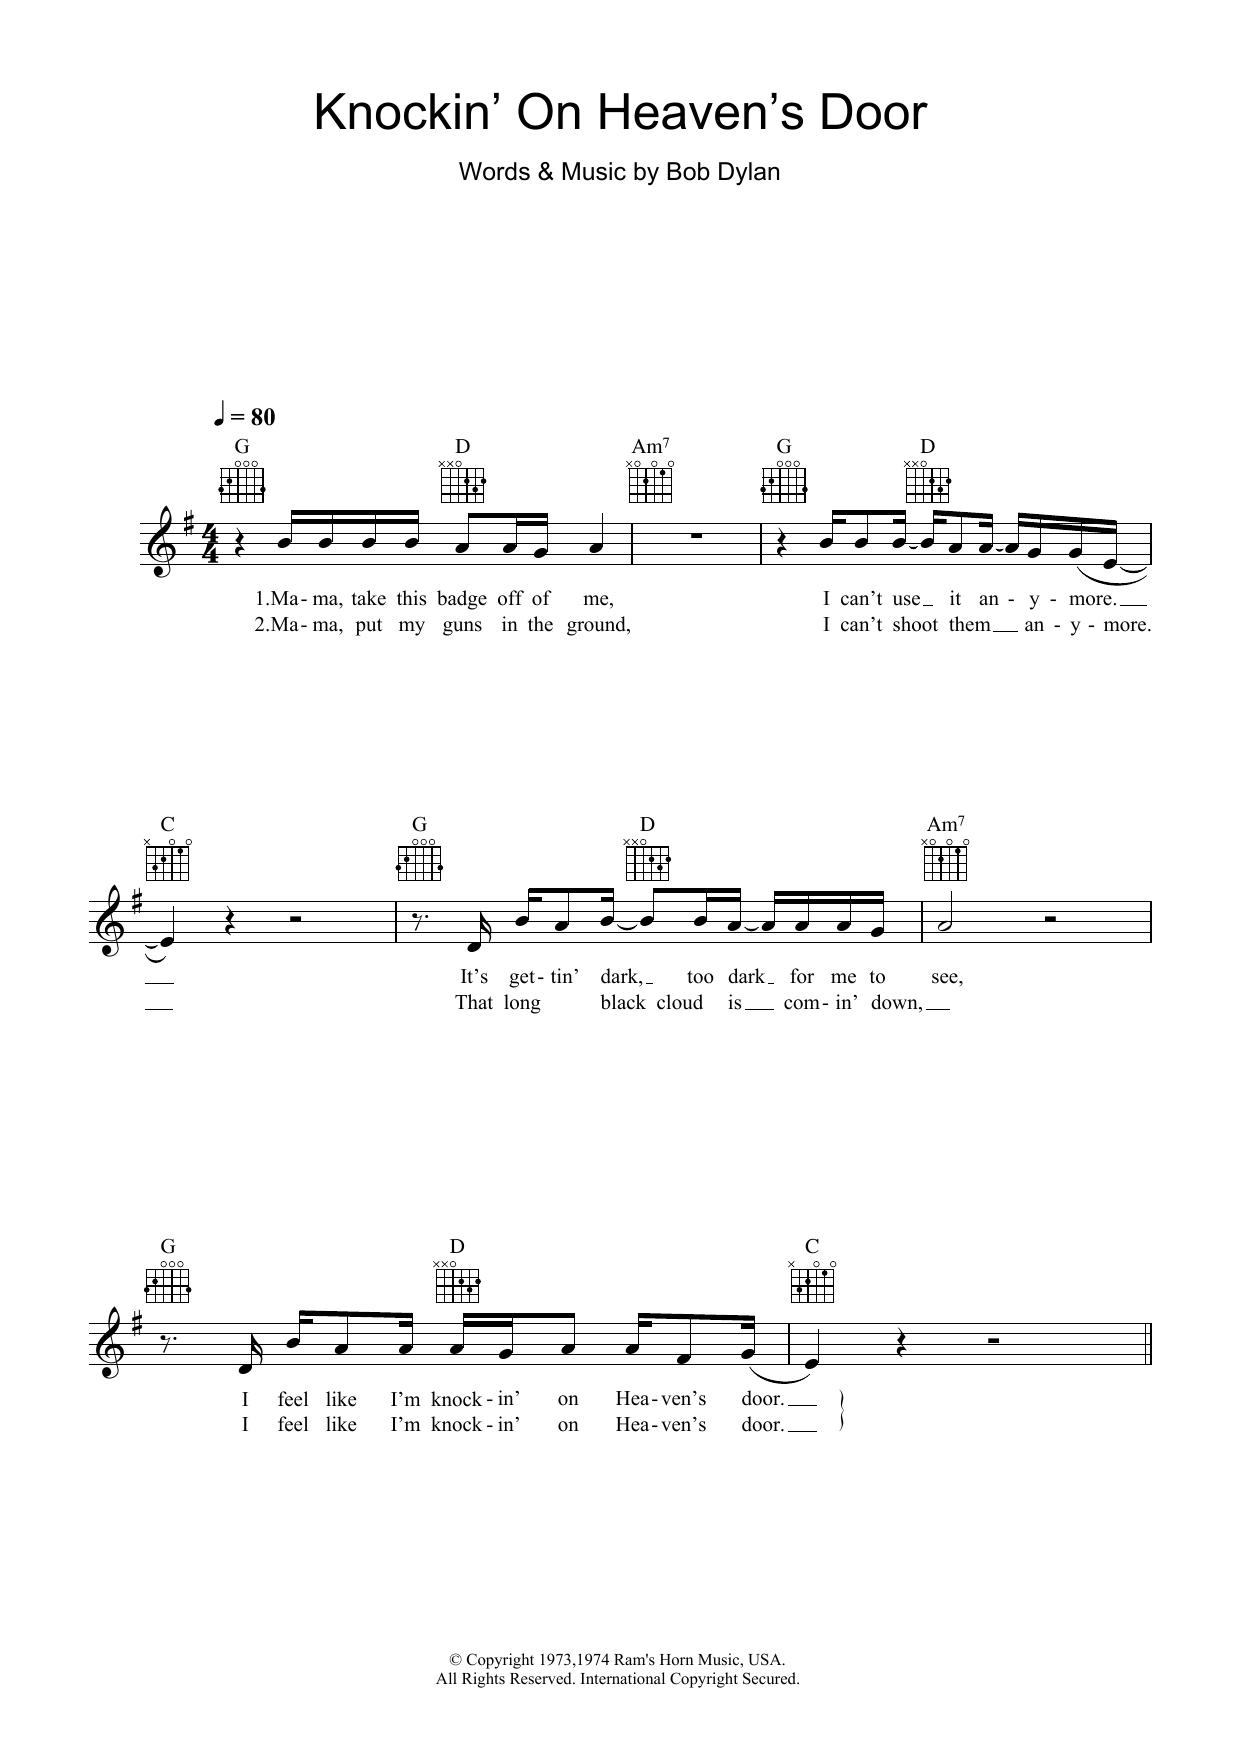 Bob Dylan Knockin On Heavens Door Sheet Music At Stantons